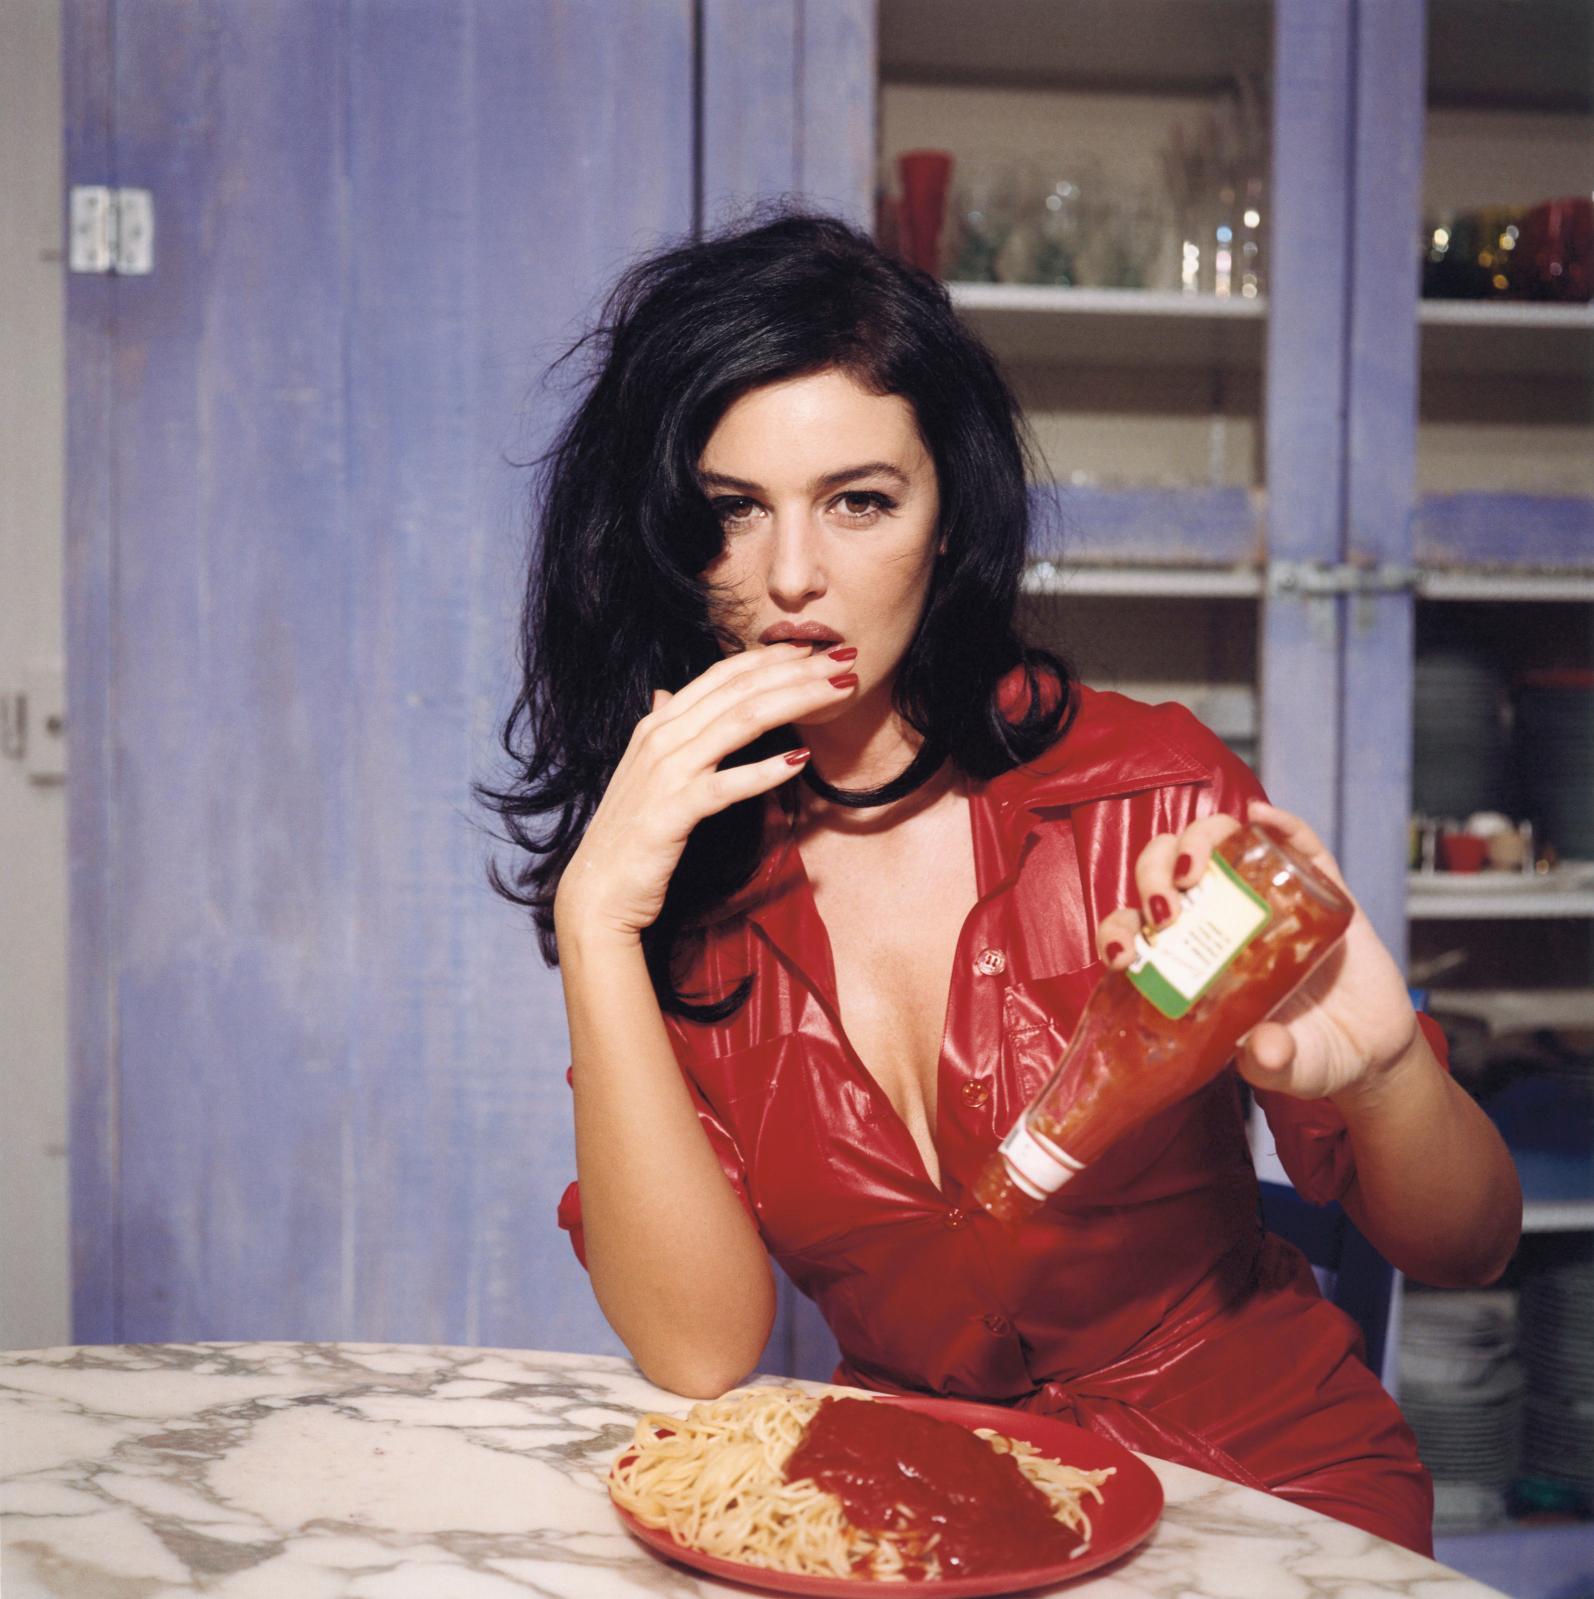 Bettina Rheims, Breakfast with Monica Bellucci, November1995, Paris.©Bettina Rheims